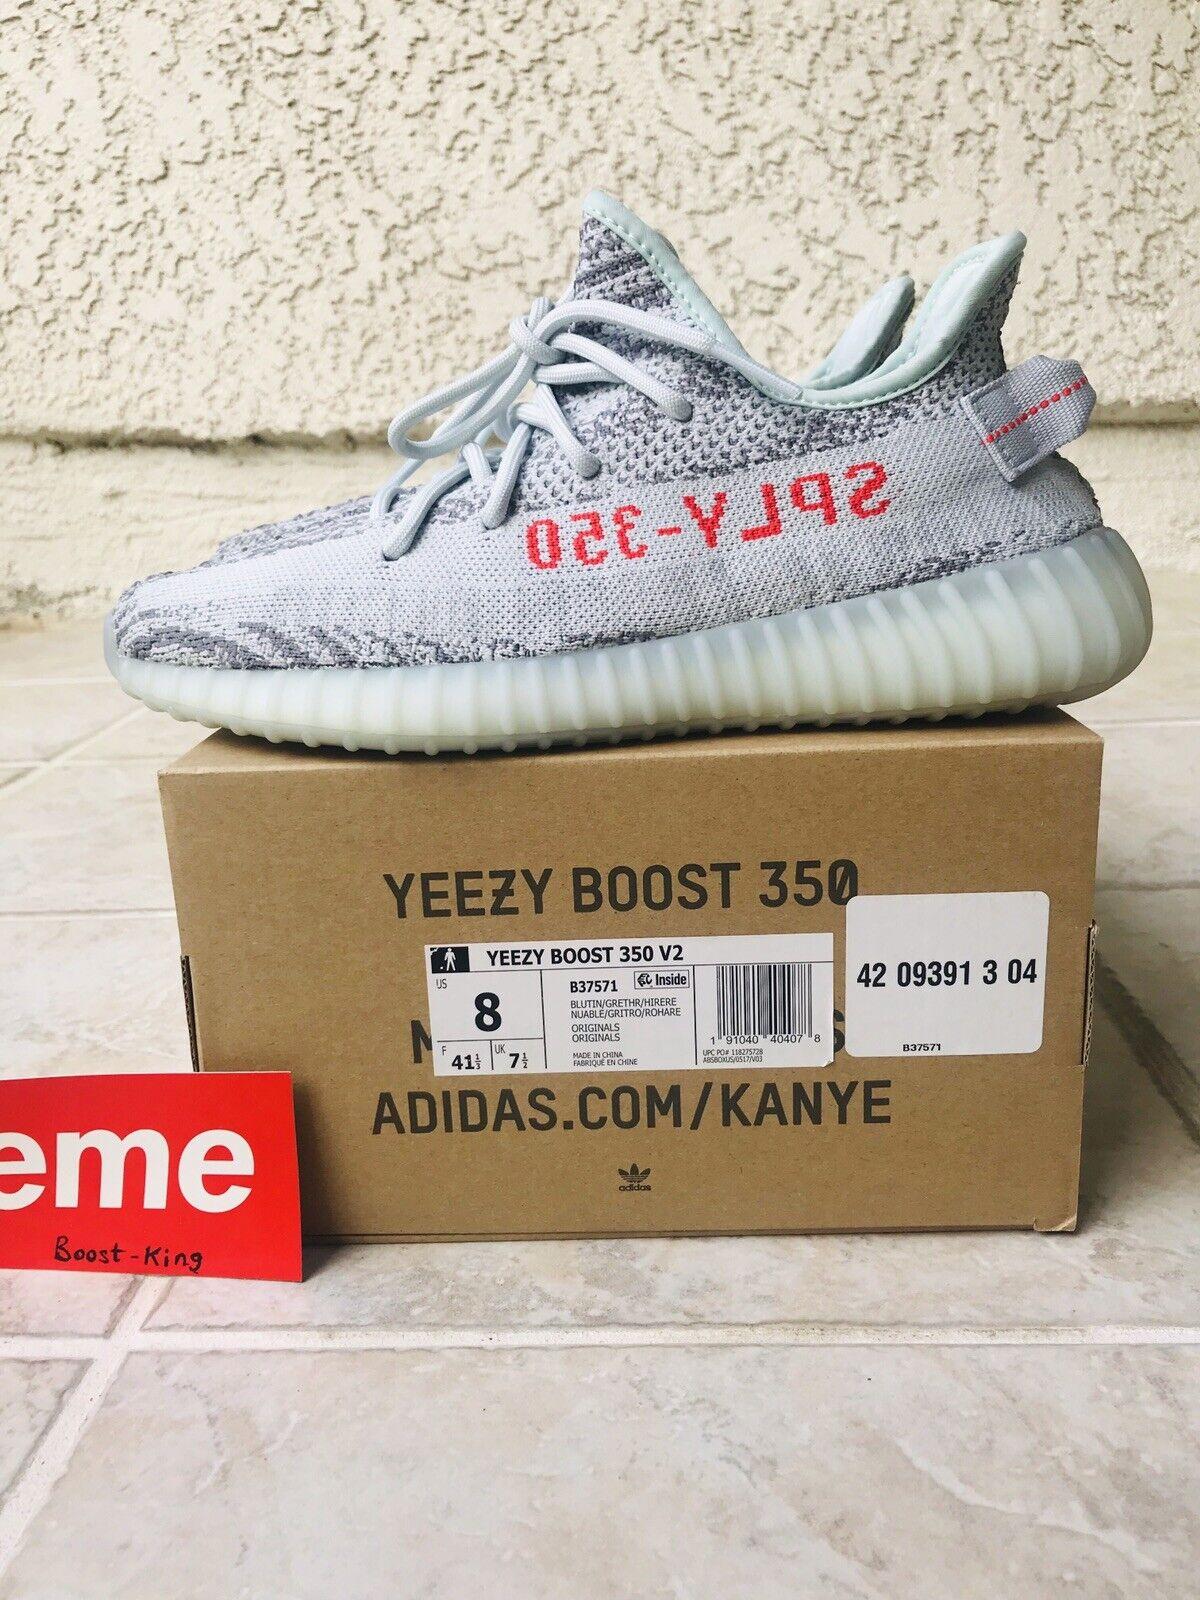 Adidas Yeezy 350 Boost V2 bluee Tint Men's size 8 VNDS